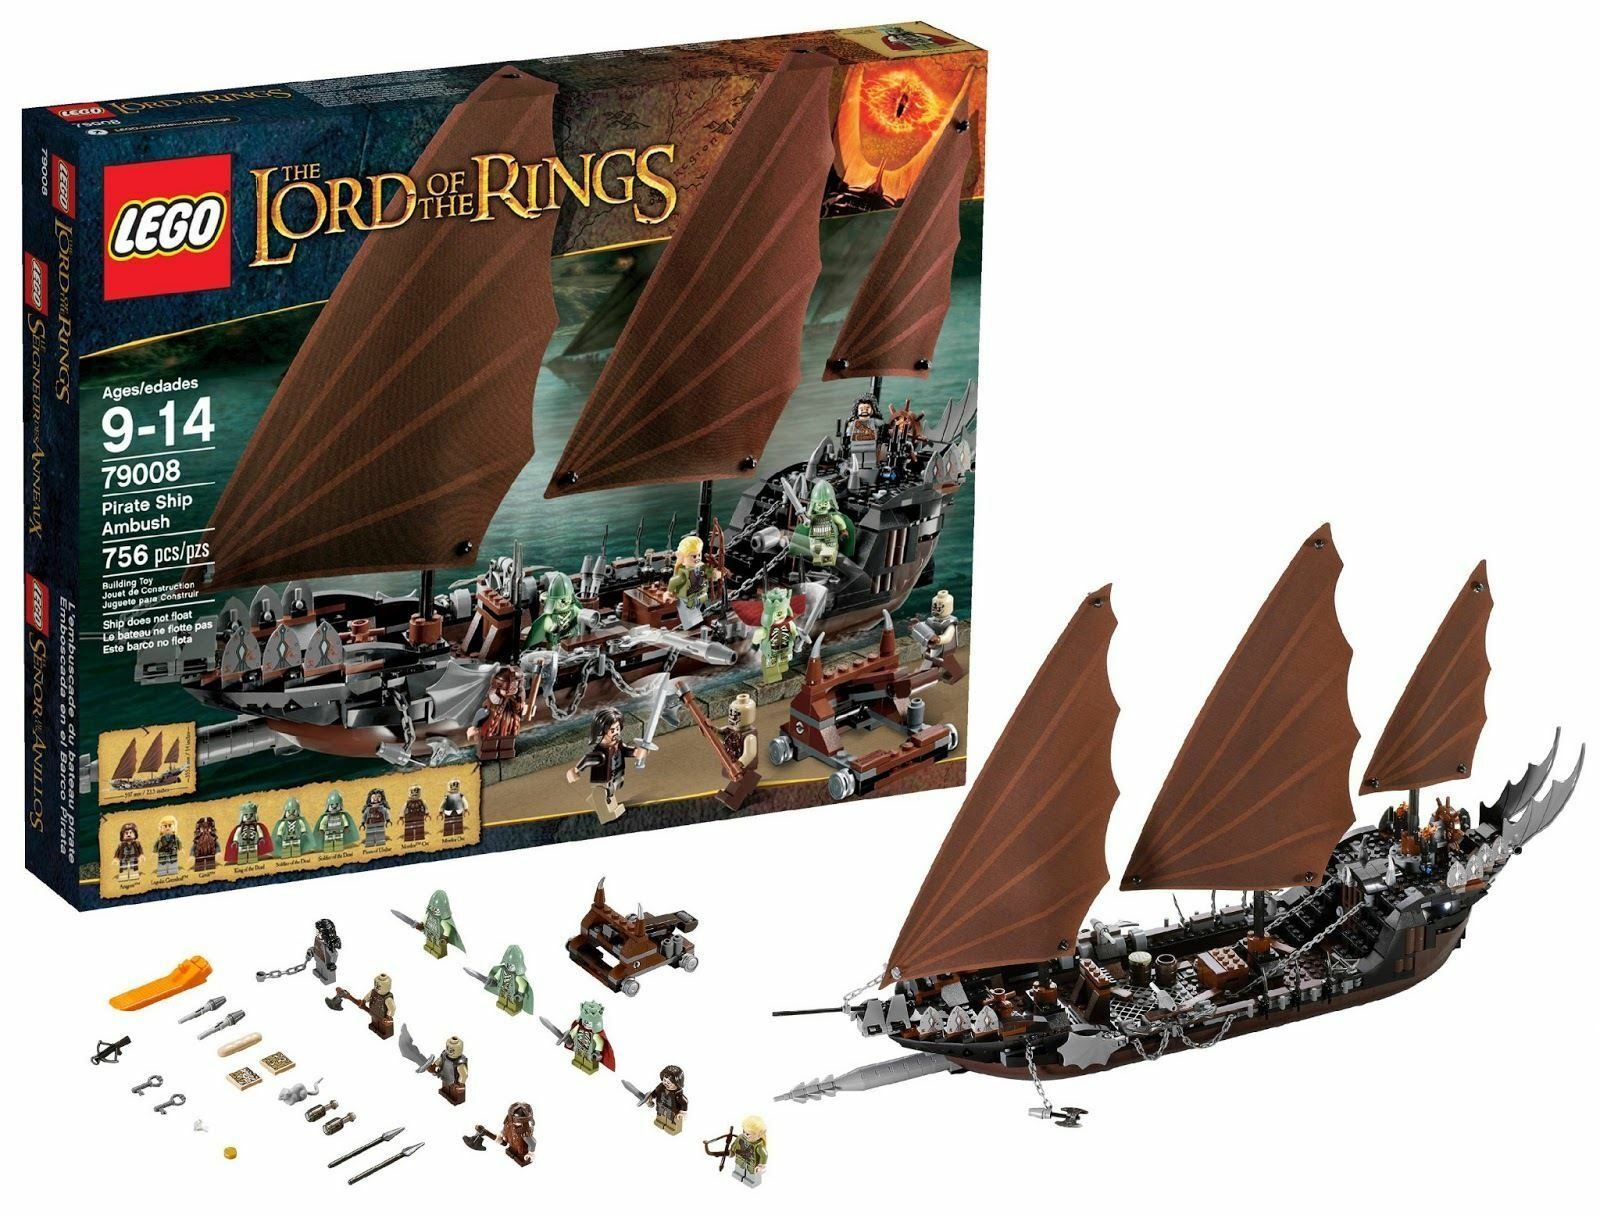 Lego 79008 The Lord Of The Rings Pirate Ship Ambush Ambush Ambush NEW 167a6e